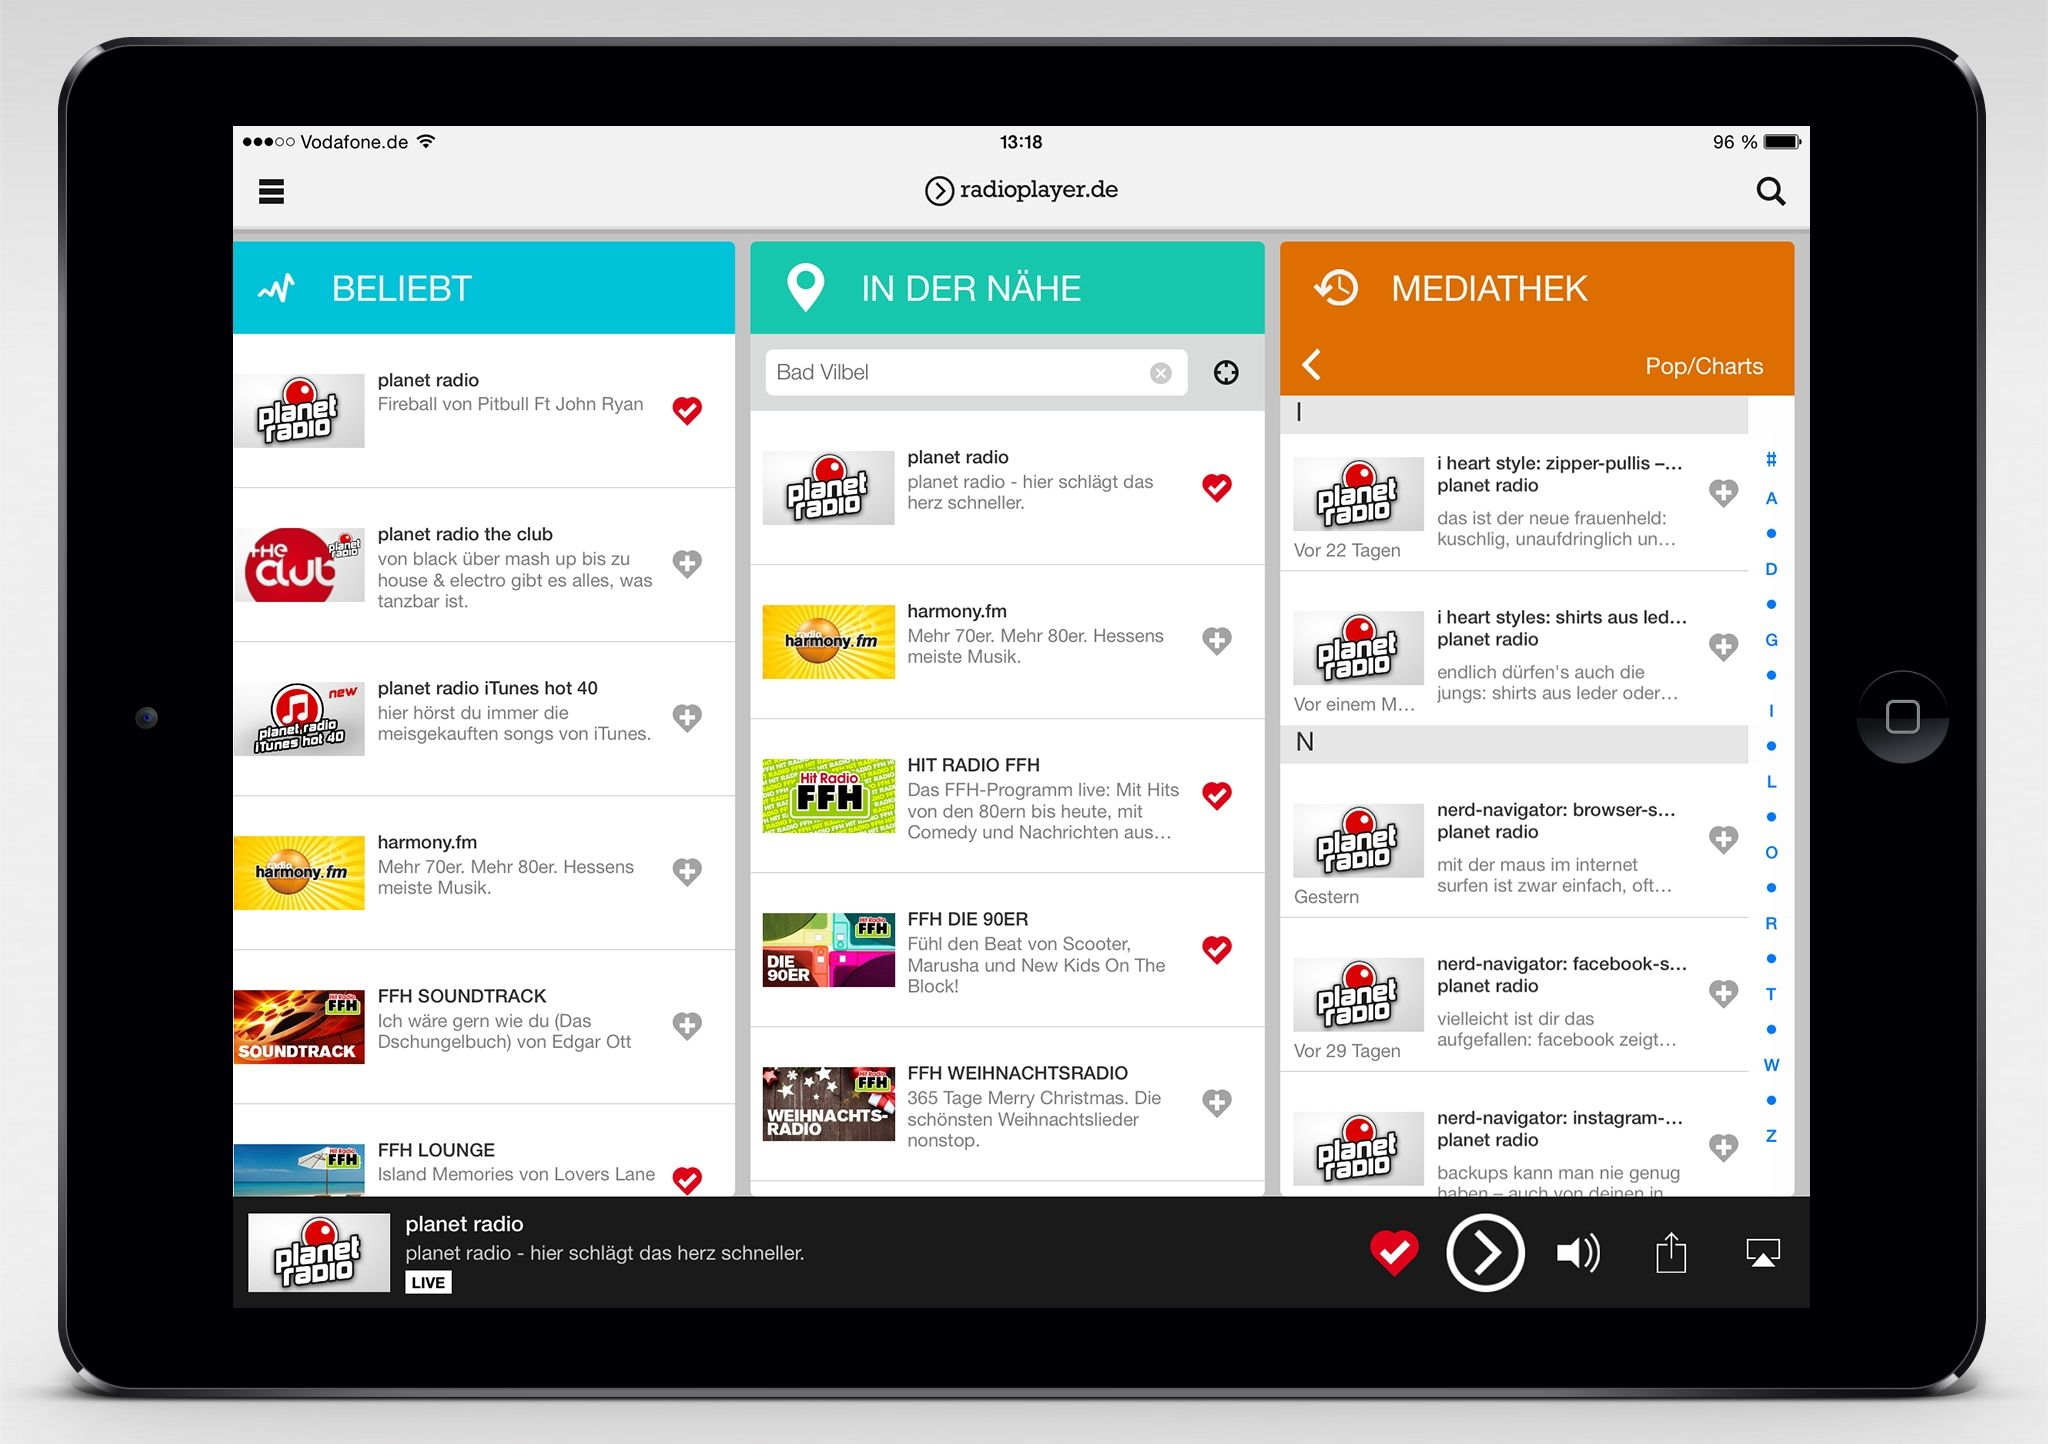 Radioplayer De App